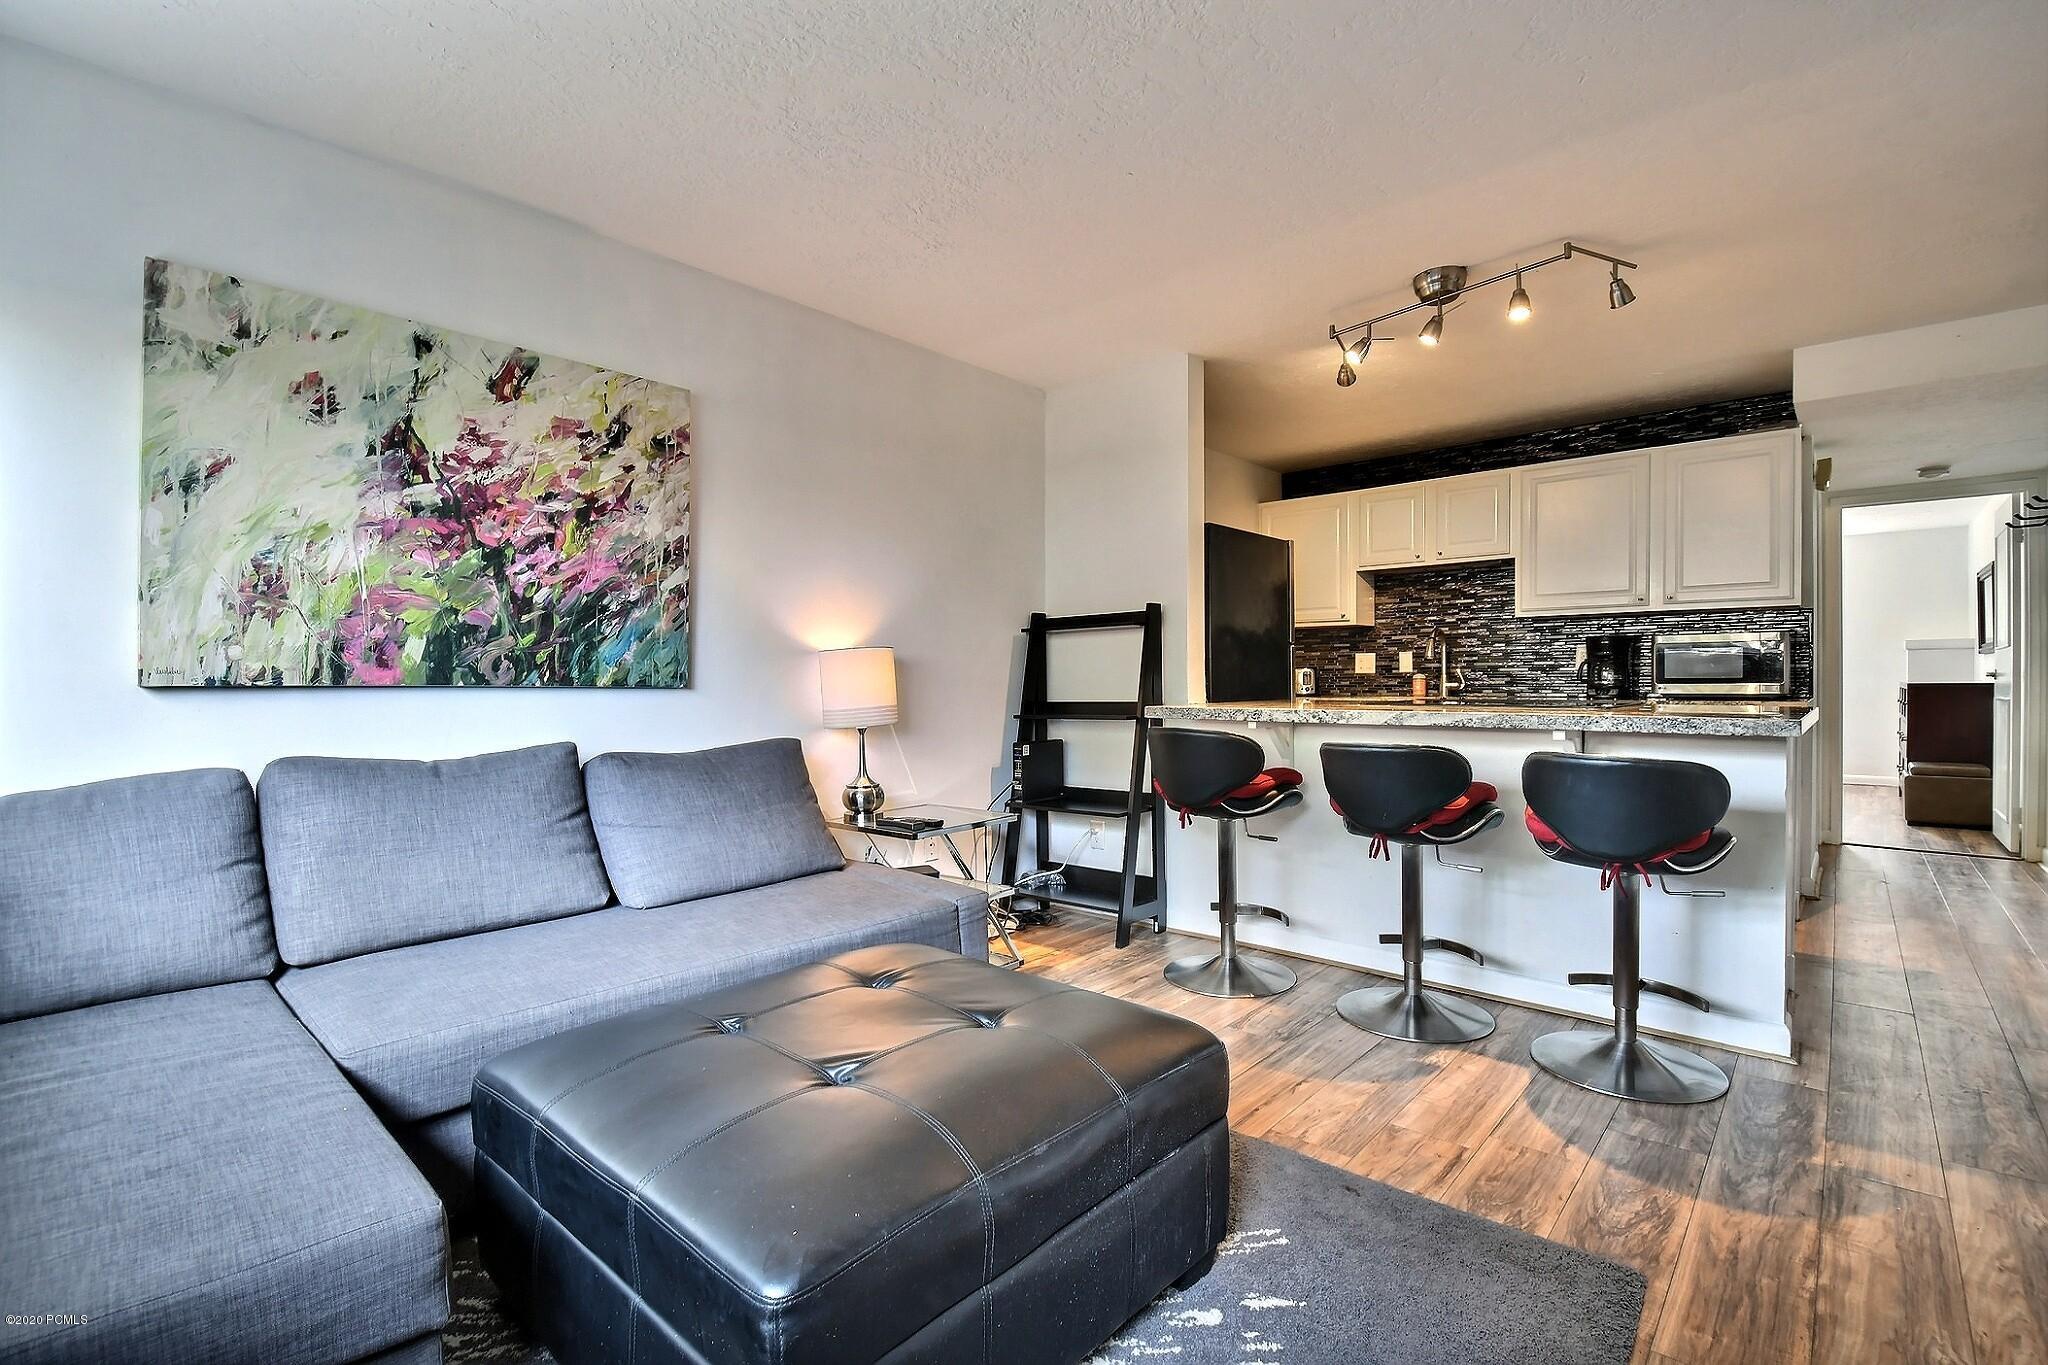 1150 Deer Valley Drive, Park City, Utah 84060, 1 Bedroom Bedrooms, ,1 BathroomBathrooms,Condominium,For Sale,Deer Valley,12003466